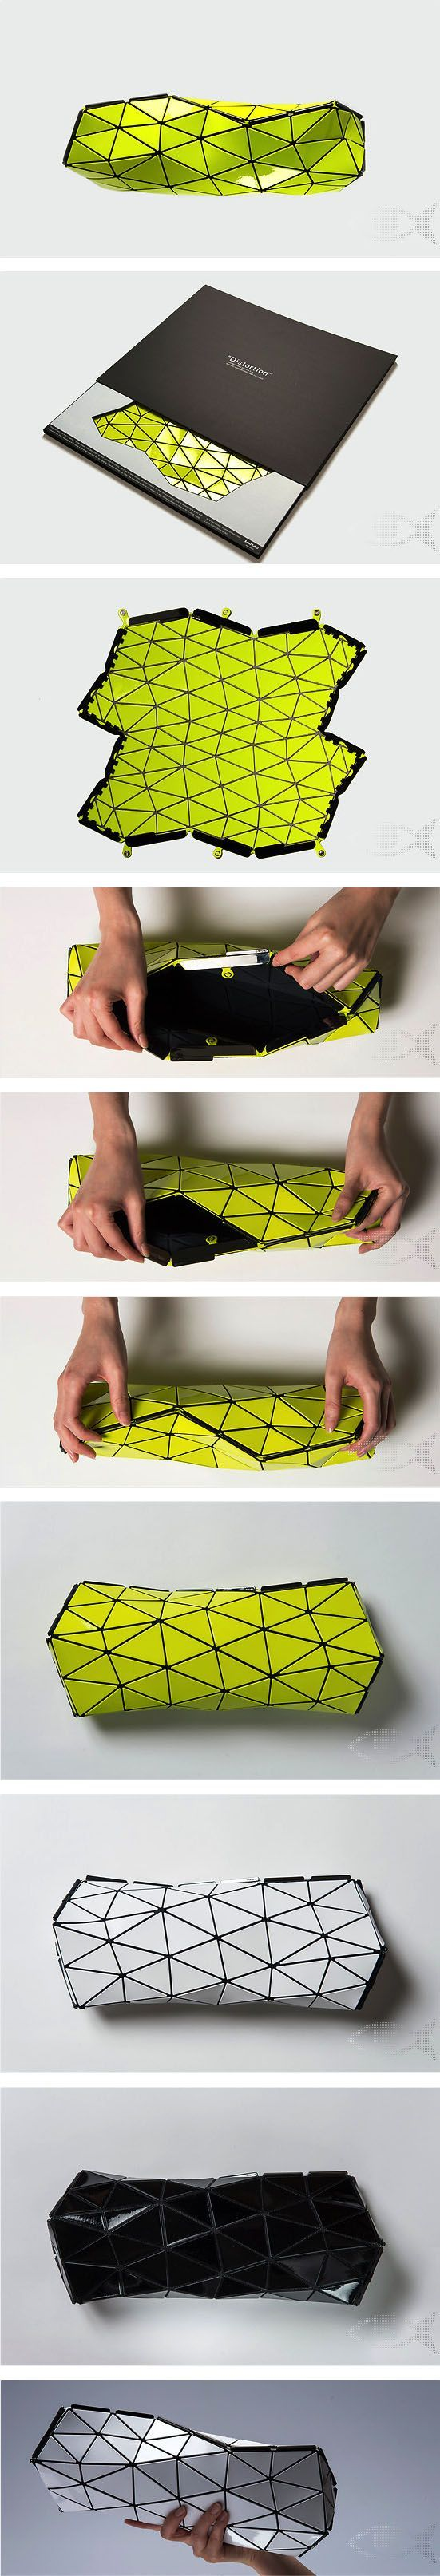 BaoBao hand bag by Issey Miyaké. Innovative folding origami-inspired clutch purse. Neat! 2D to 3D. Multi-dimensional. - purses and handbags designer, handbags womens, purse black *sponsored https://www.pinterest.com/purses_handbags/ https://www.pinterest.com/explore/purse/ https://www.pinterest.com/purses_handbags/leather-purses/ https://www.toryburch.com/sales-handbags/